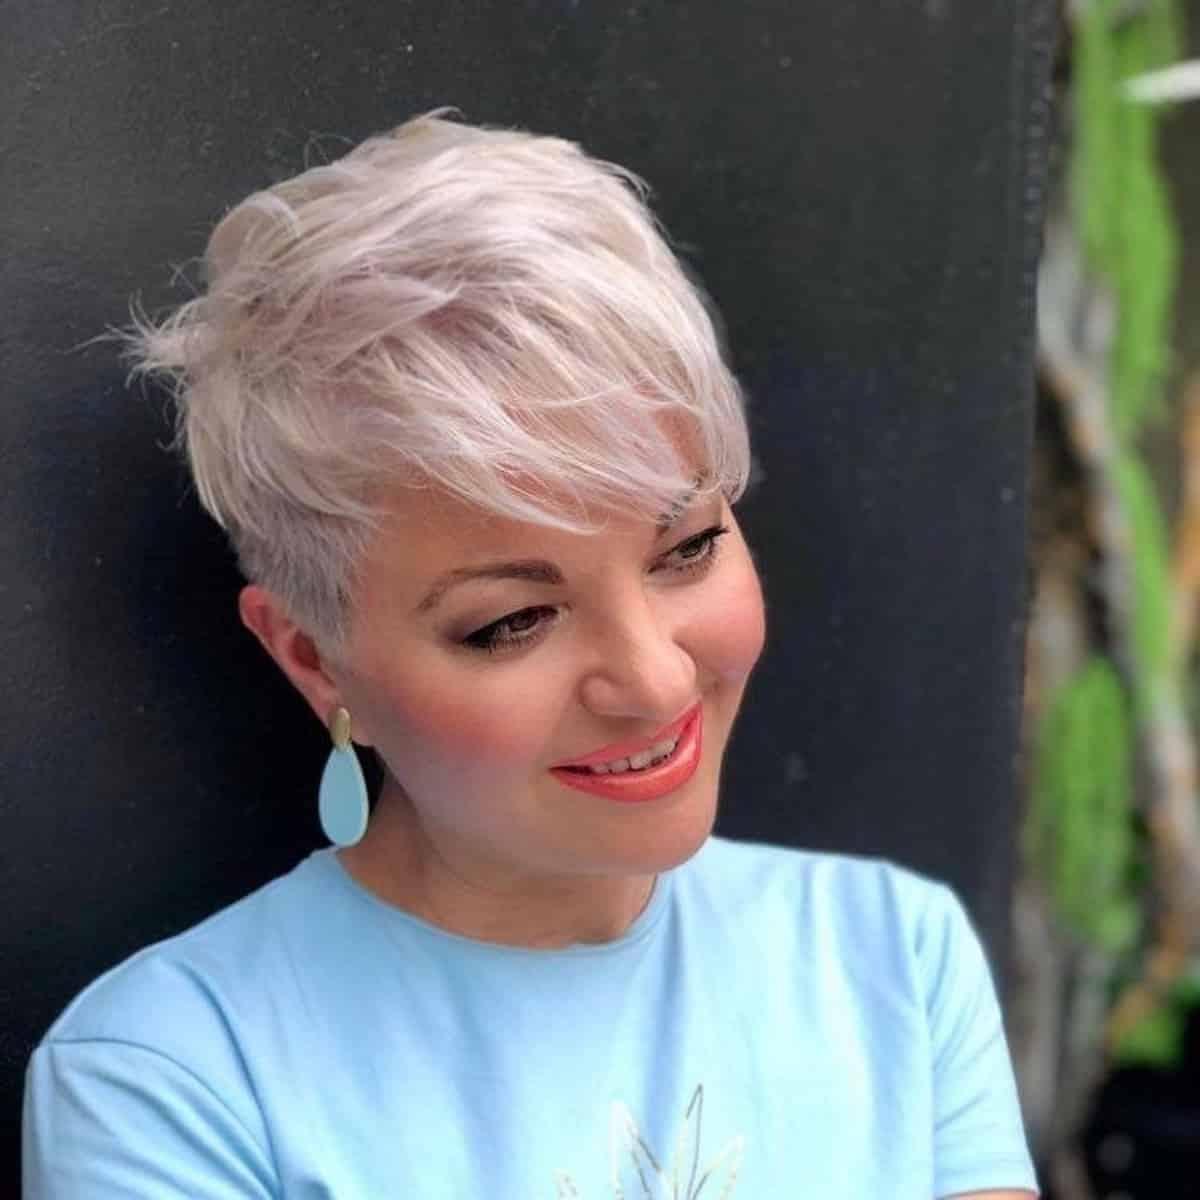 Pixie Undercut para mujeres con cabello plateado